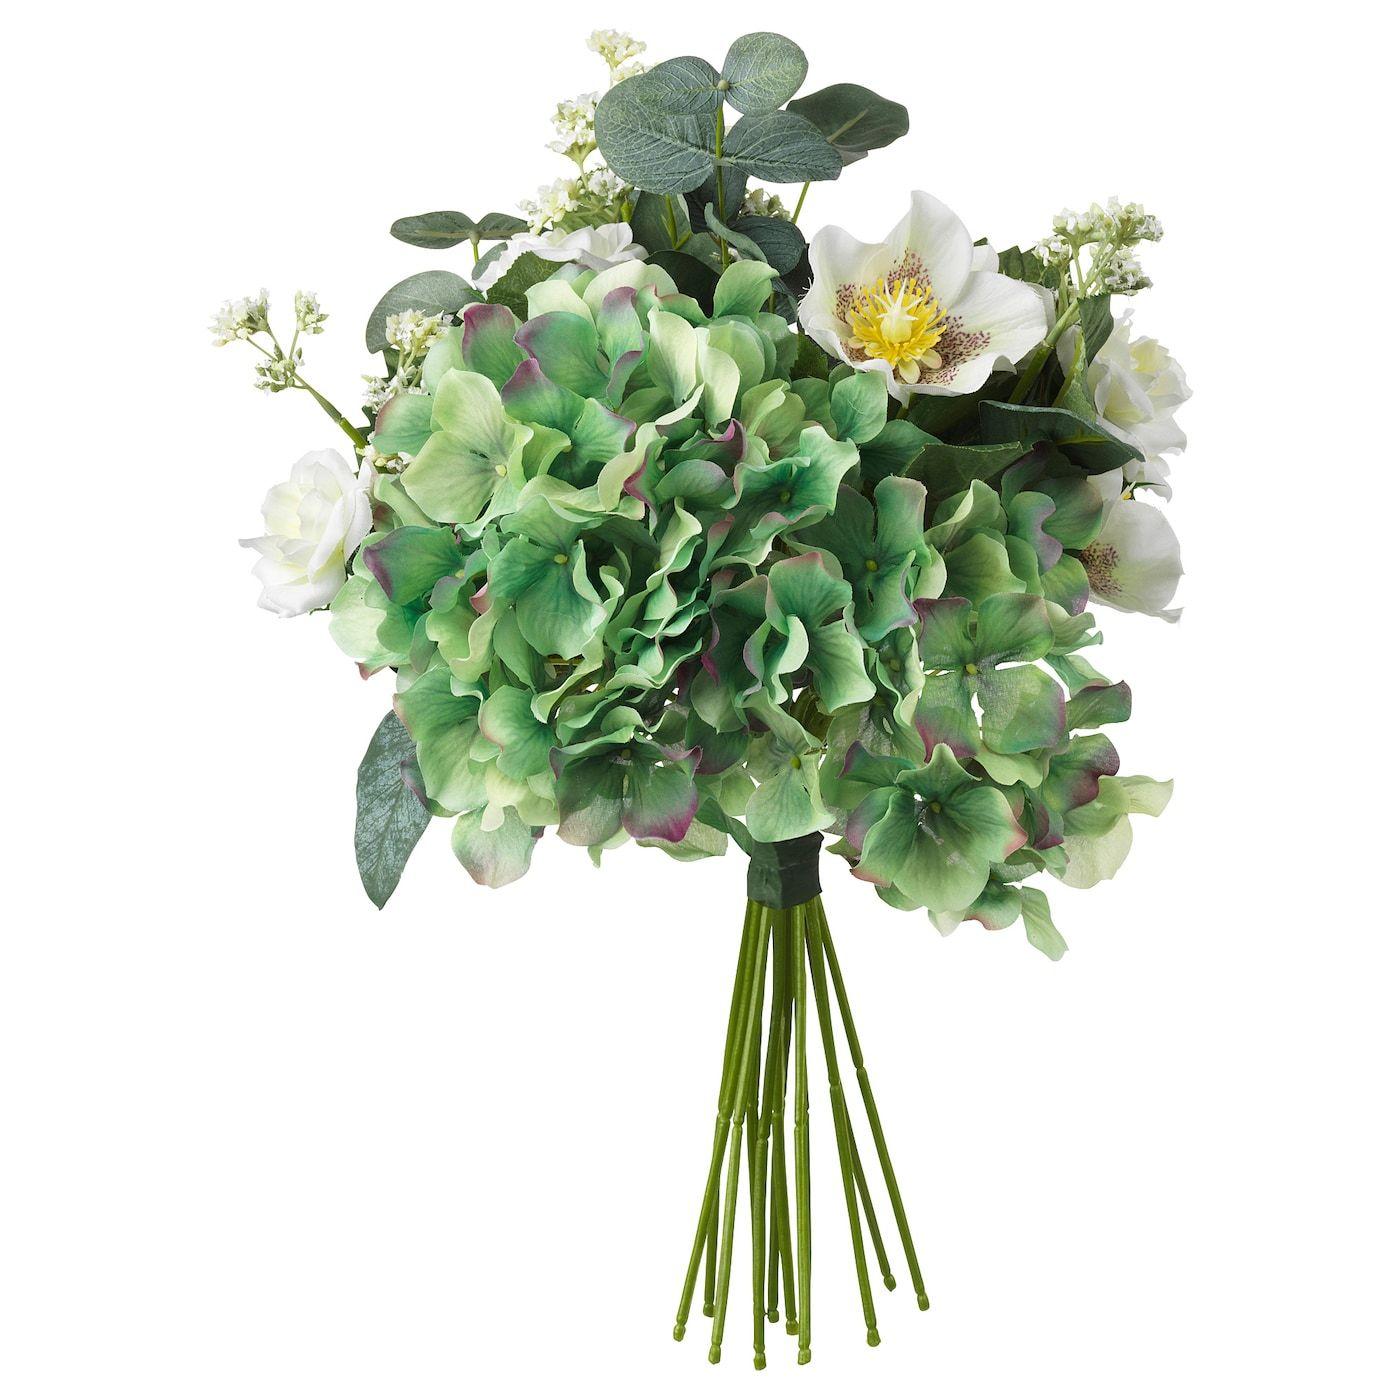 Smycka Artificial Bouquet White Ikea In 2020 Artificial Bouquet Artificial Potted Plants Artificial Flower Bouquet